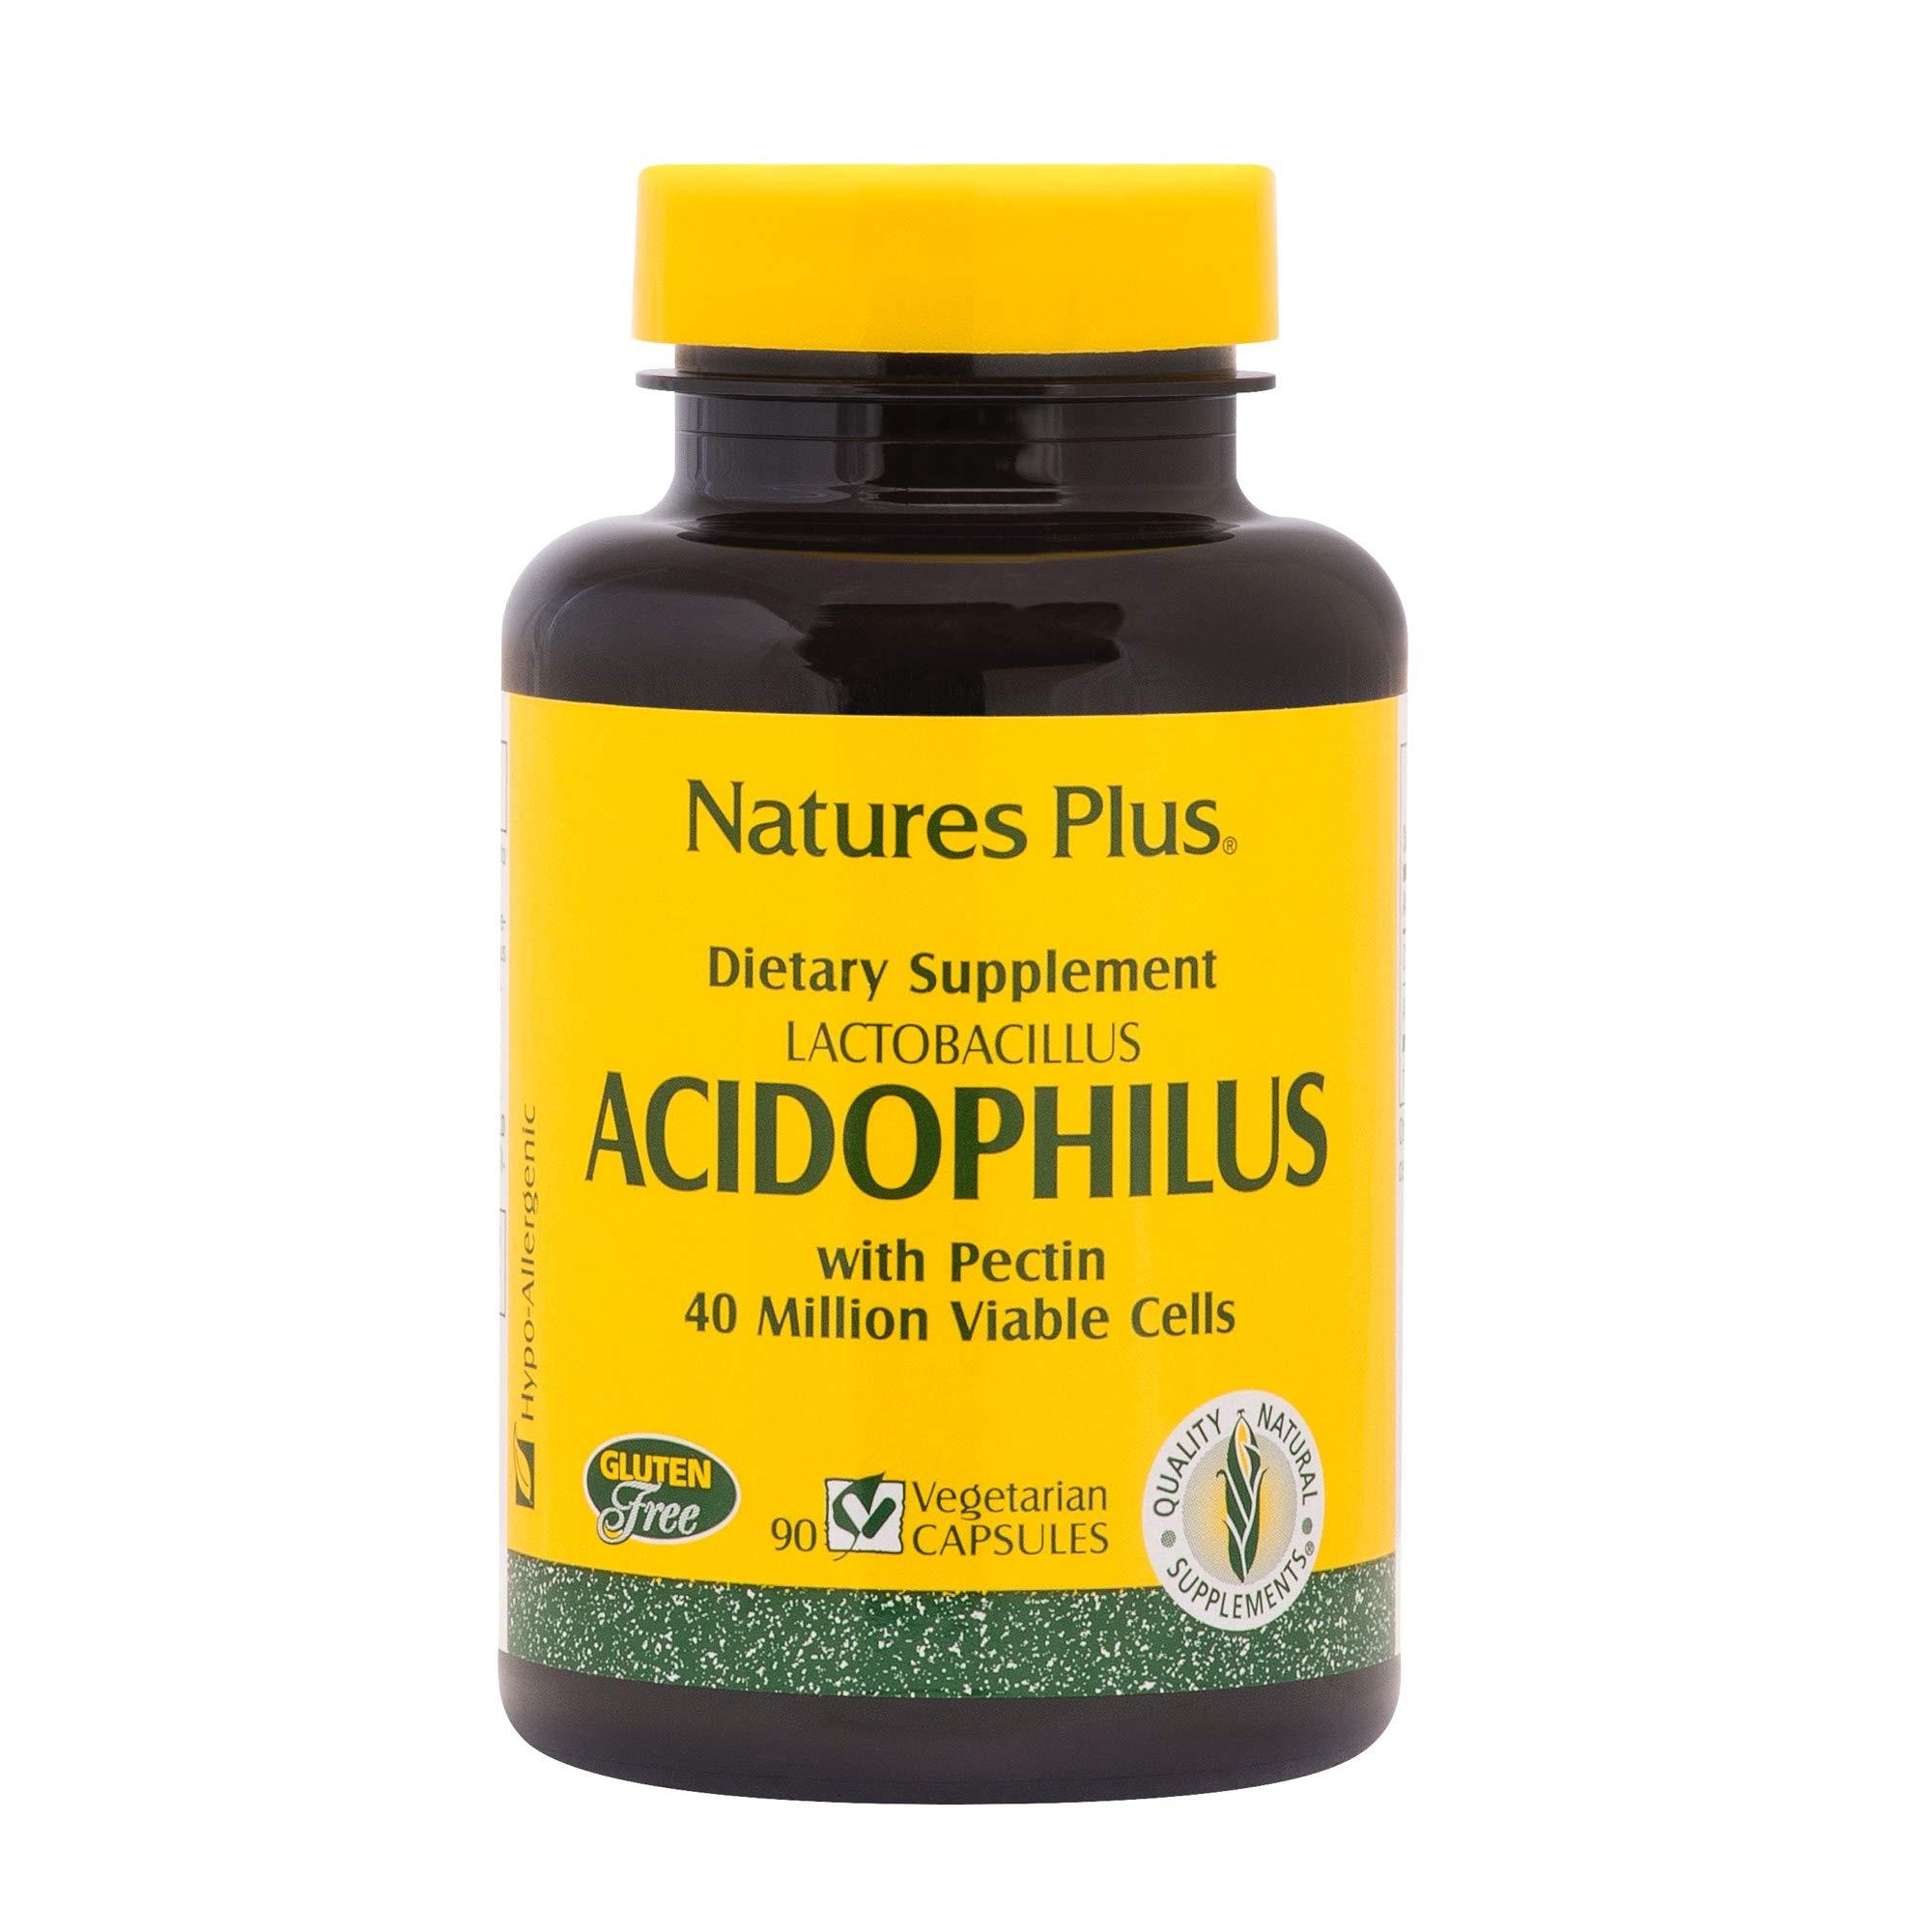 NaturesPlus Acidophilus - 40 Million CFU Lactobacillus Acidophilus, 90 Vegetarian Capsules - Probiotic Supplement with Pectin, Supports Healthy Digestion - Gluten-Free - 90 Servings by Nature's Plus